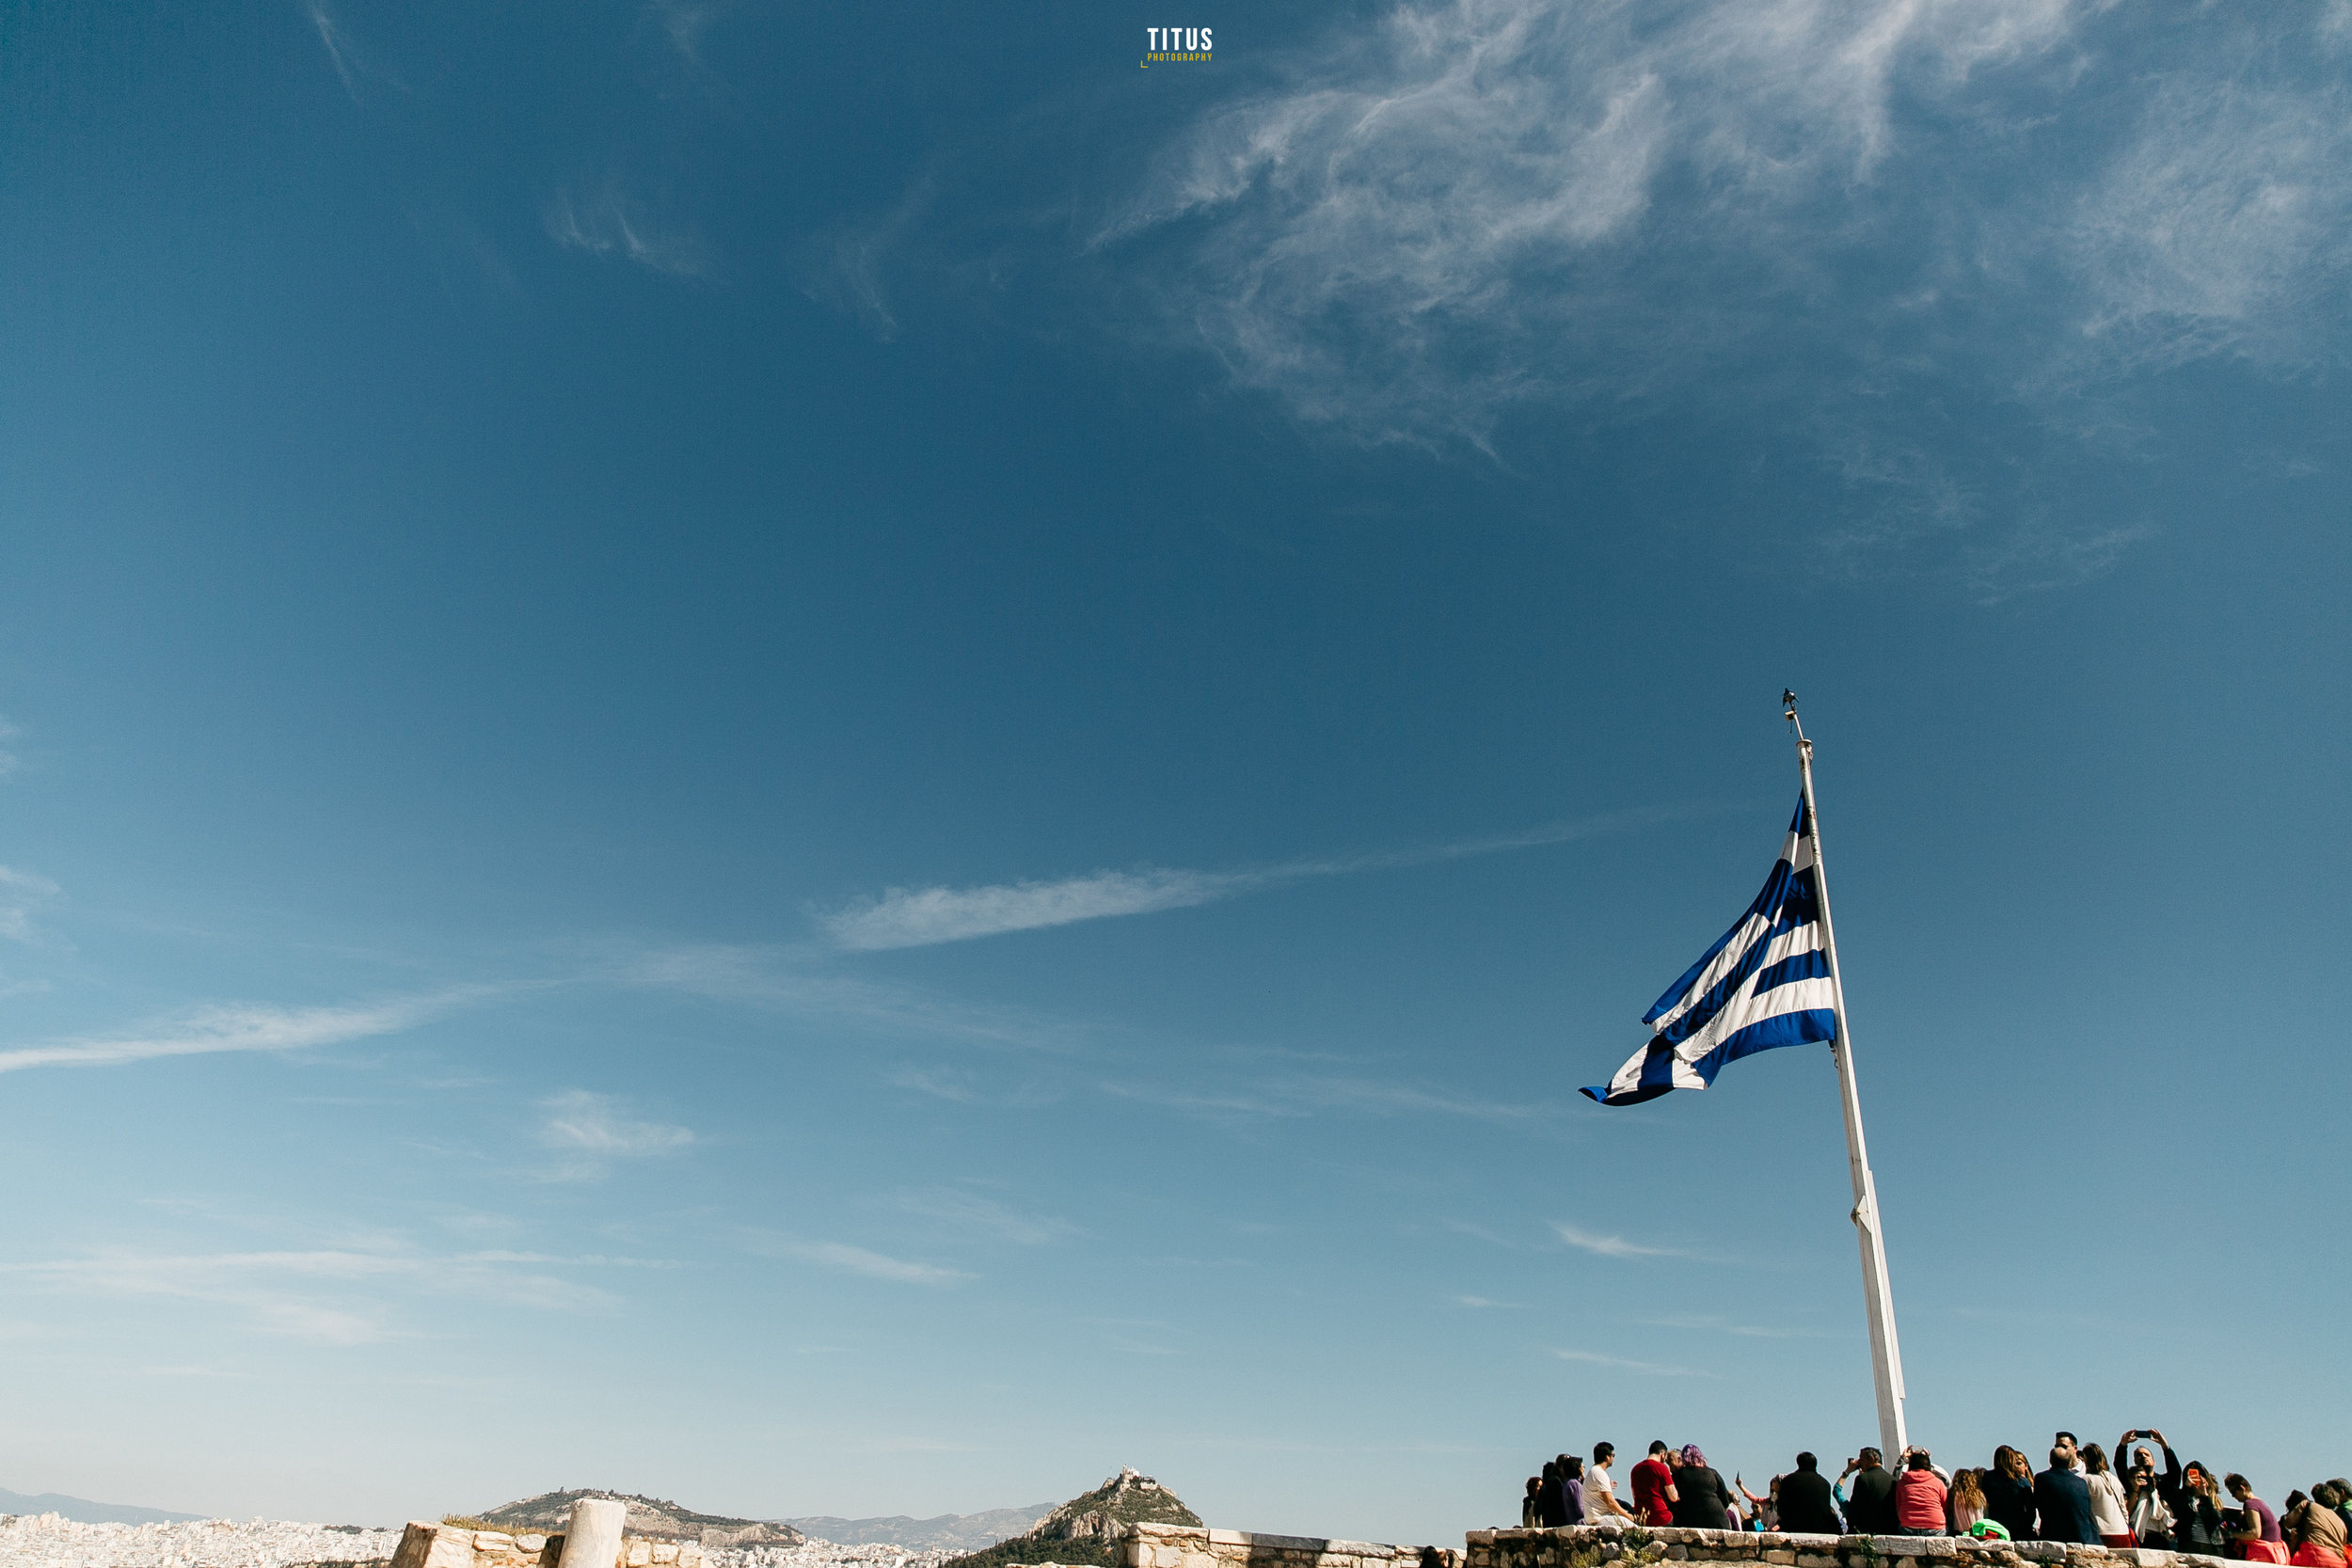 038-mons-athens-blog images.JPG